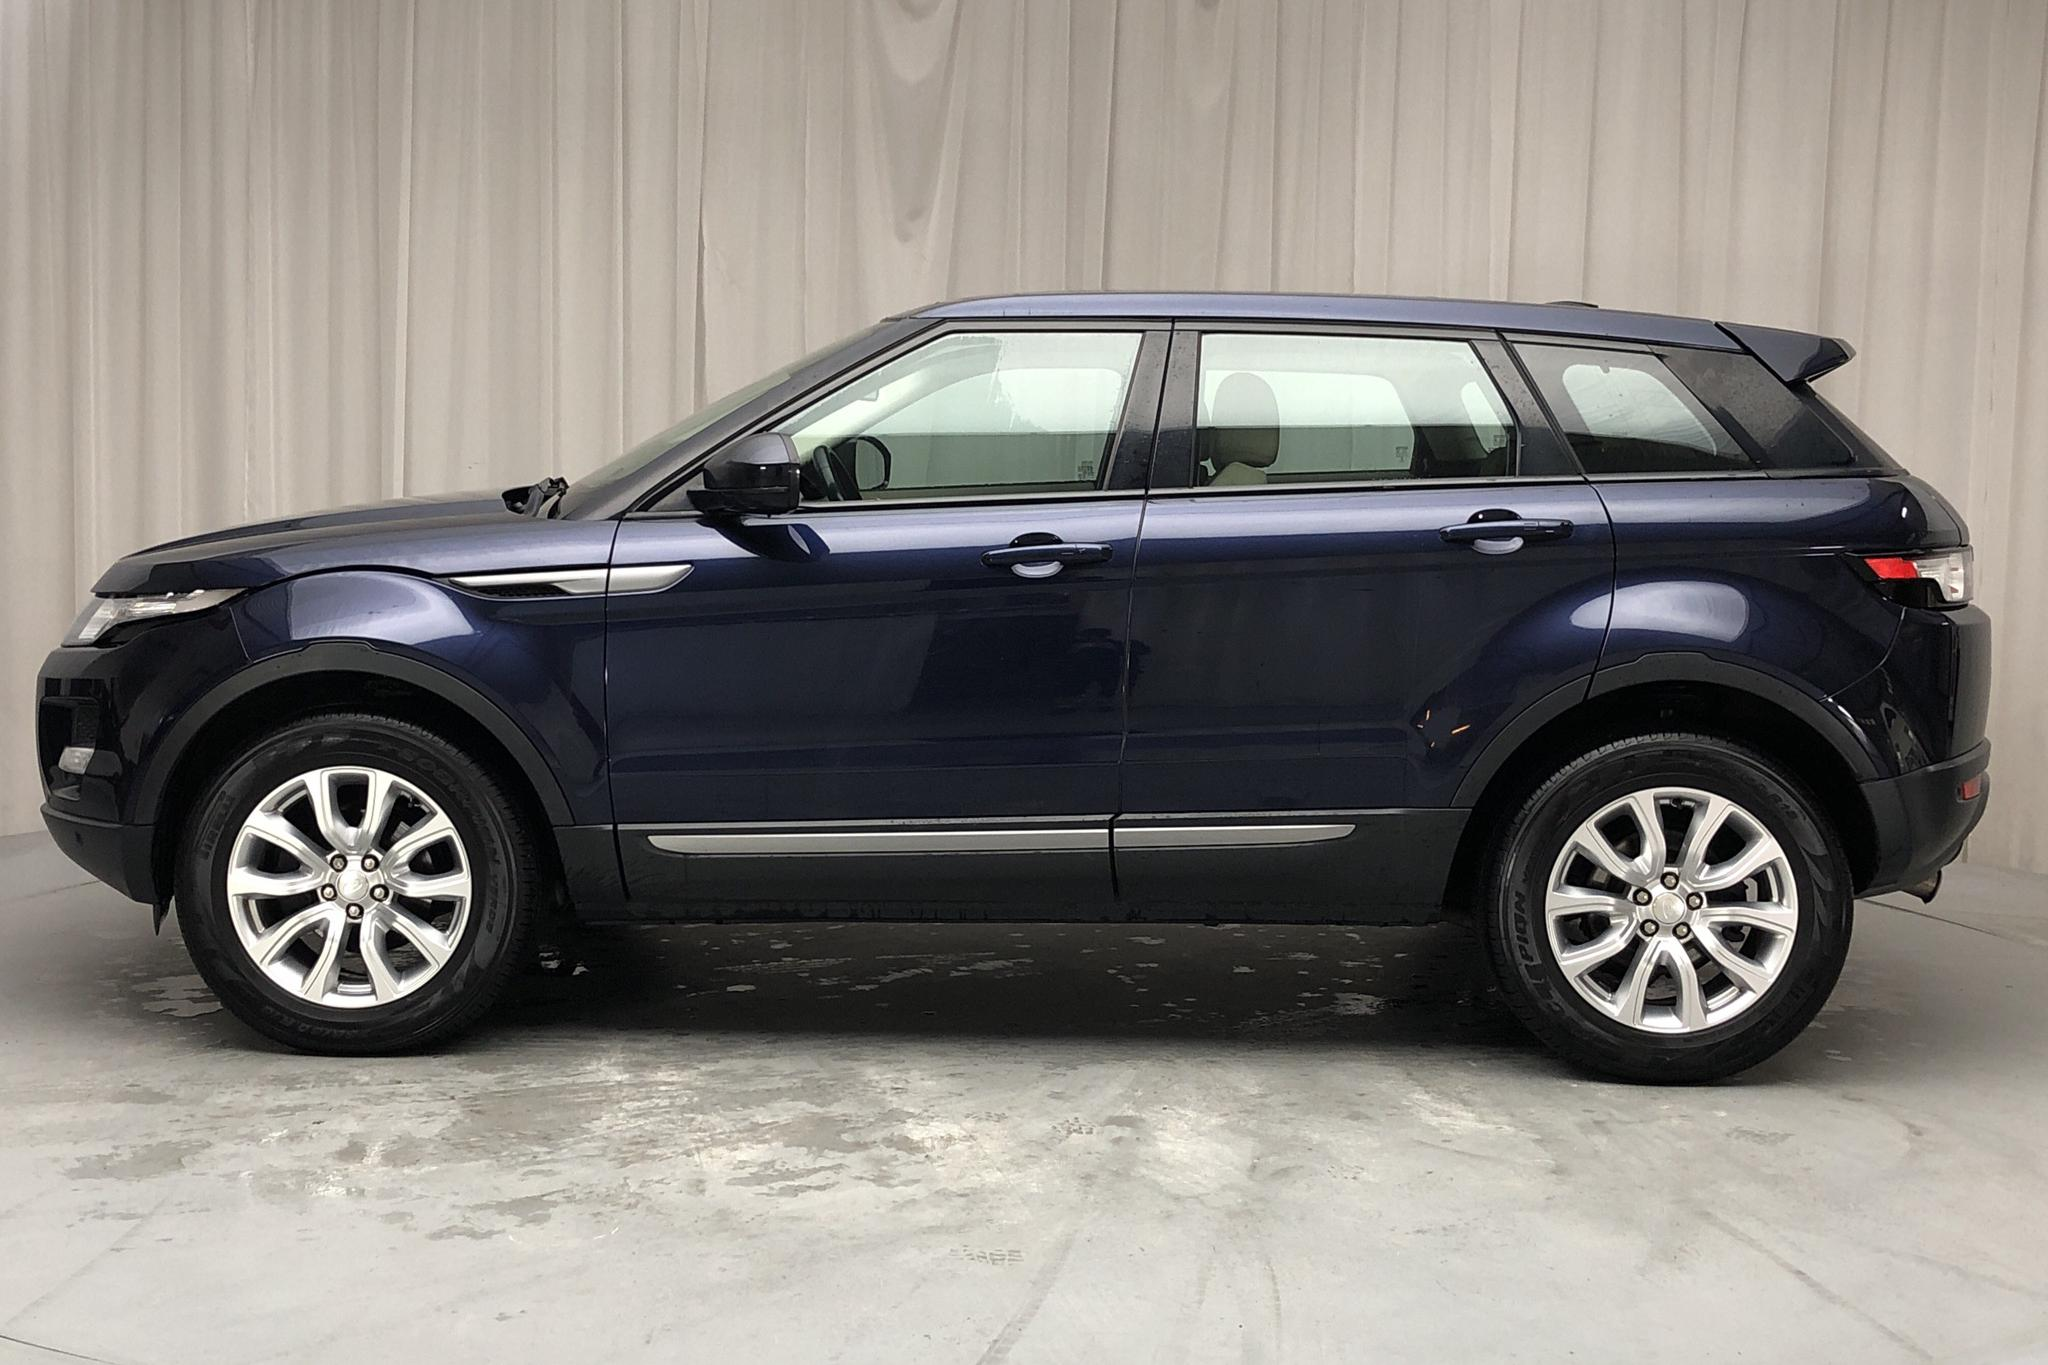 Land Rover Range Rover Evoque 2.2 TD4 5dr (150hk) - 174 310 km - Automatic - blue - 2014